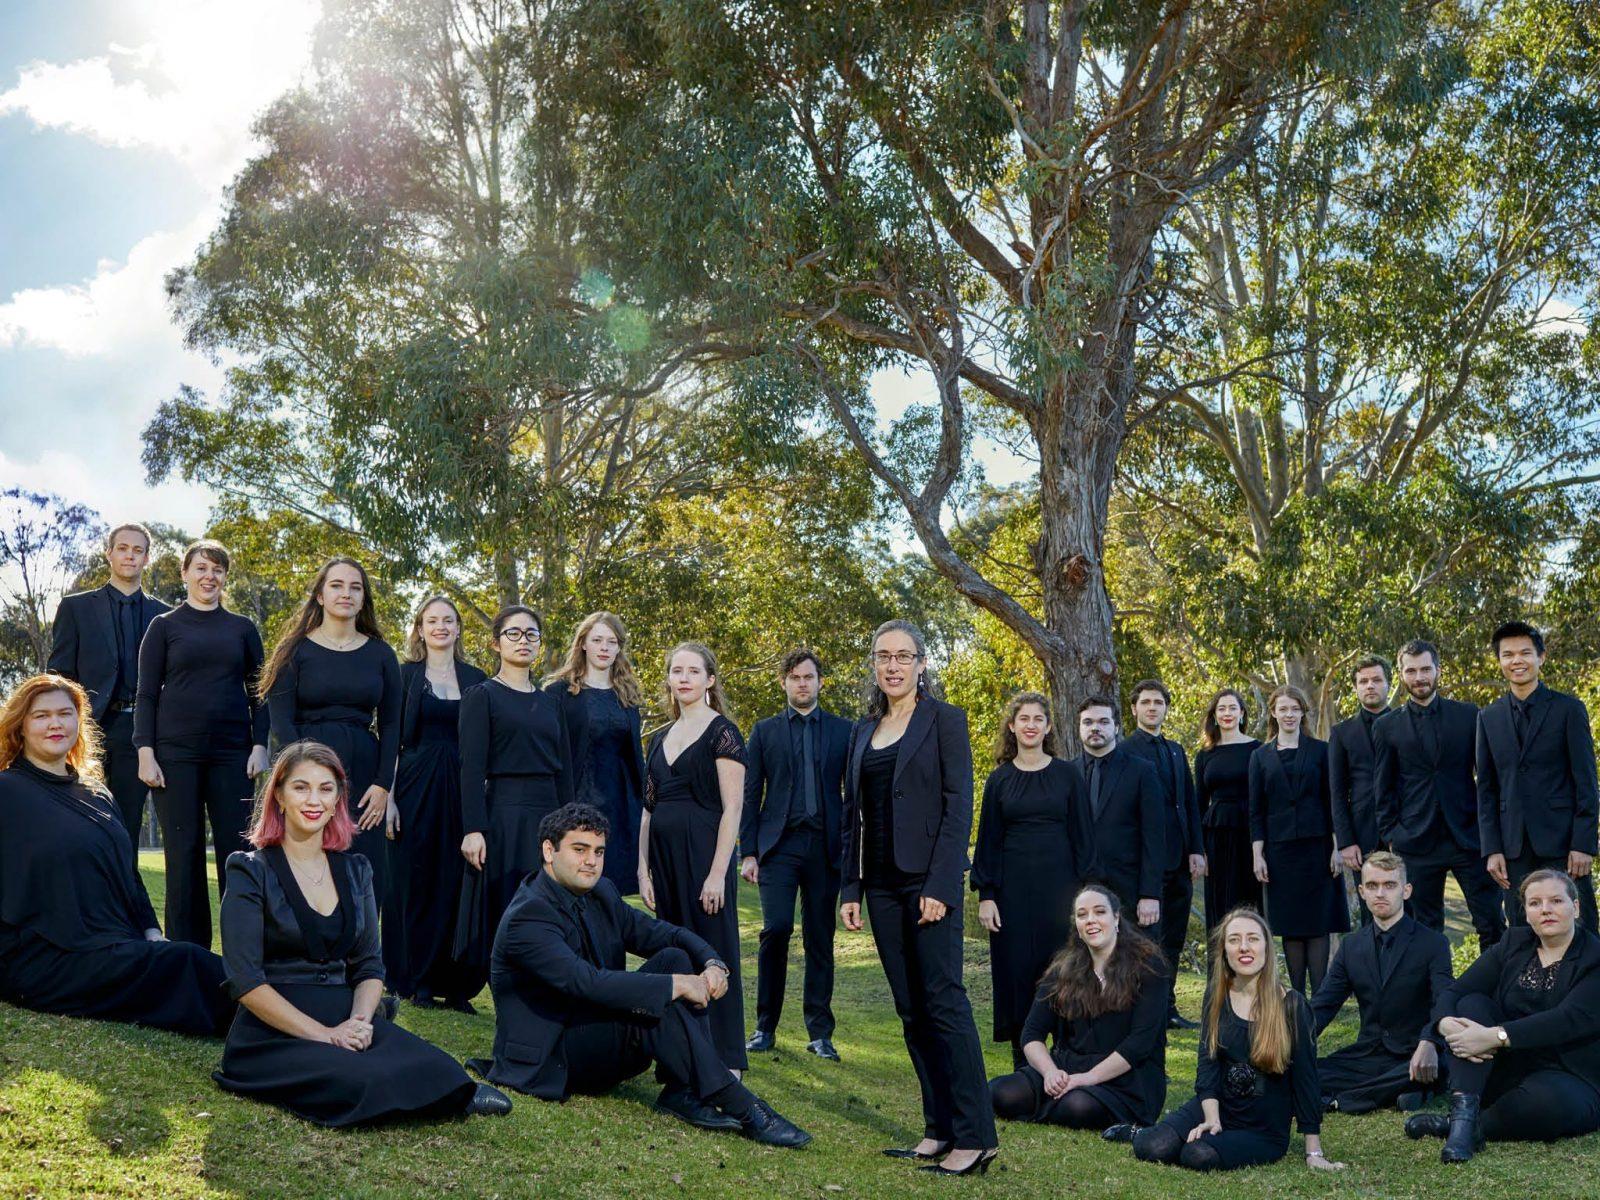 Sydney Philharmonia VOX Choir. Photo by Keith Saunders.